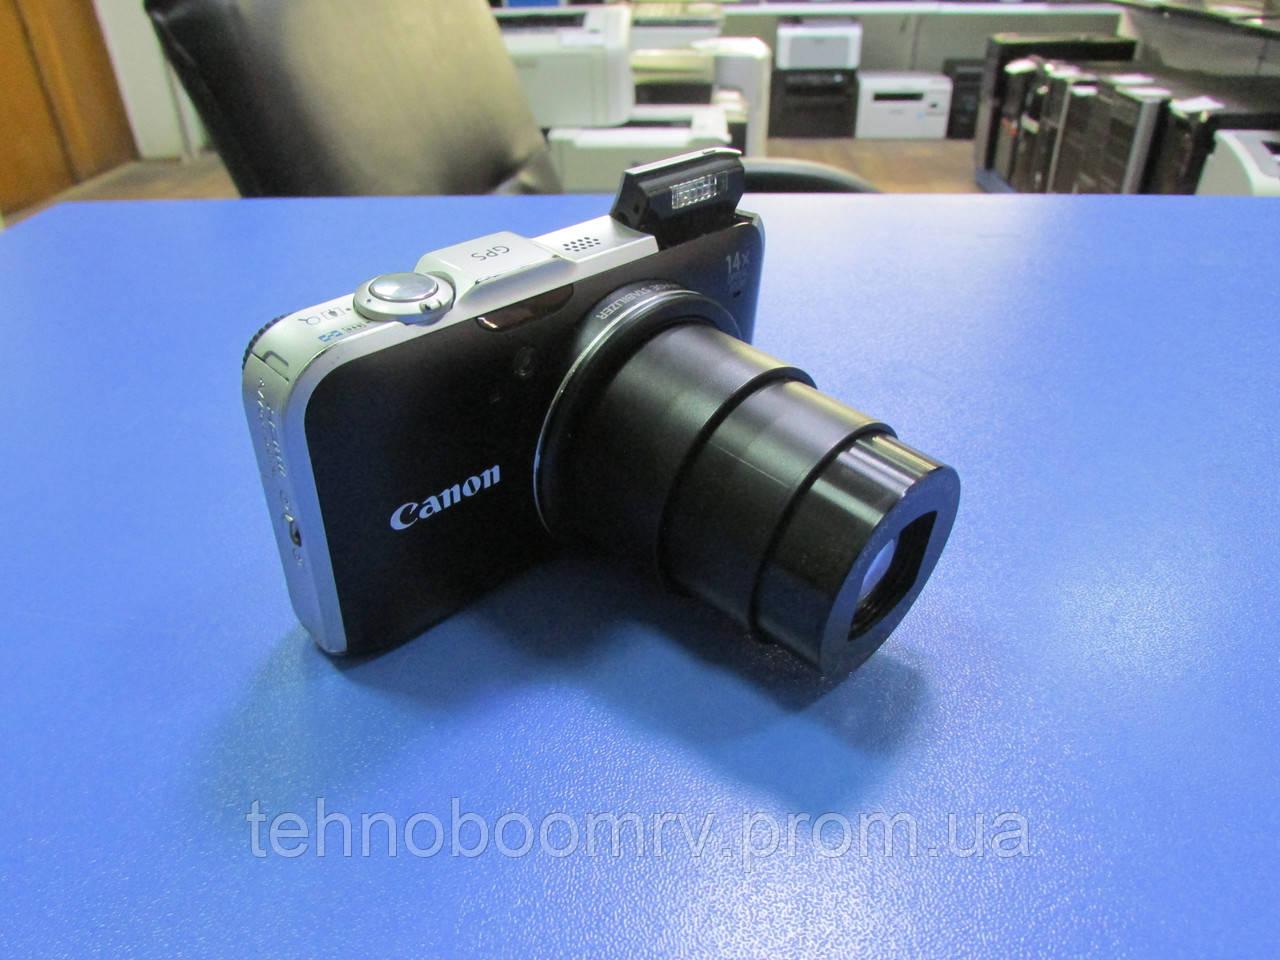 Фотоаппарат Canon SX230 IS - 12MP - ЗУМ: Оптич. 14Х; Цифр.4Х + подарок